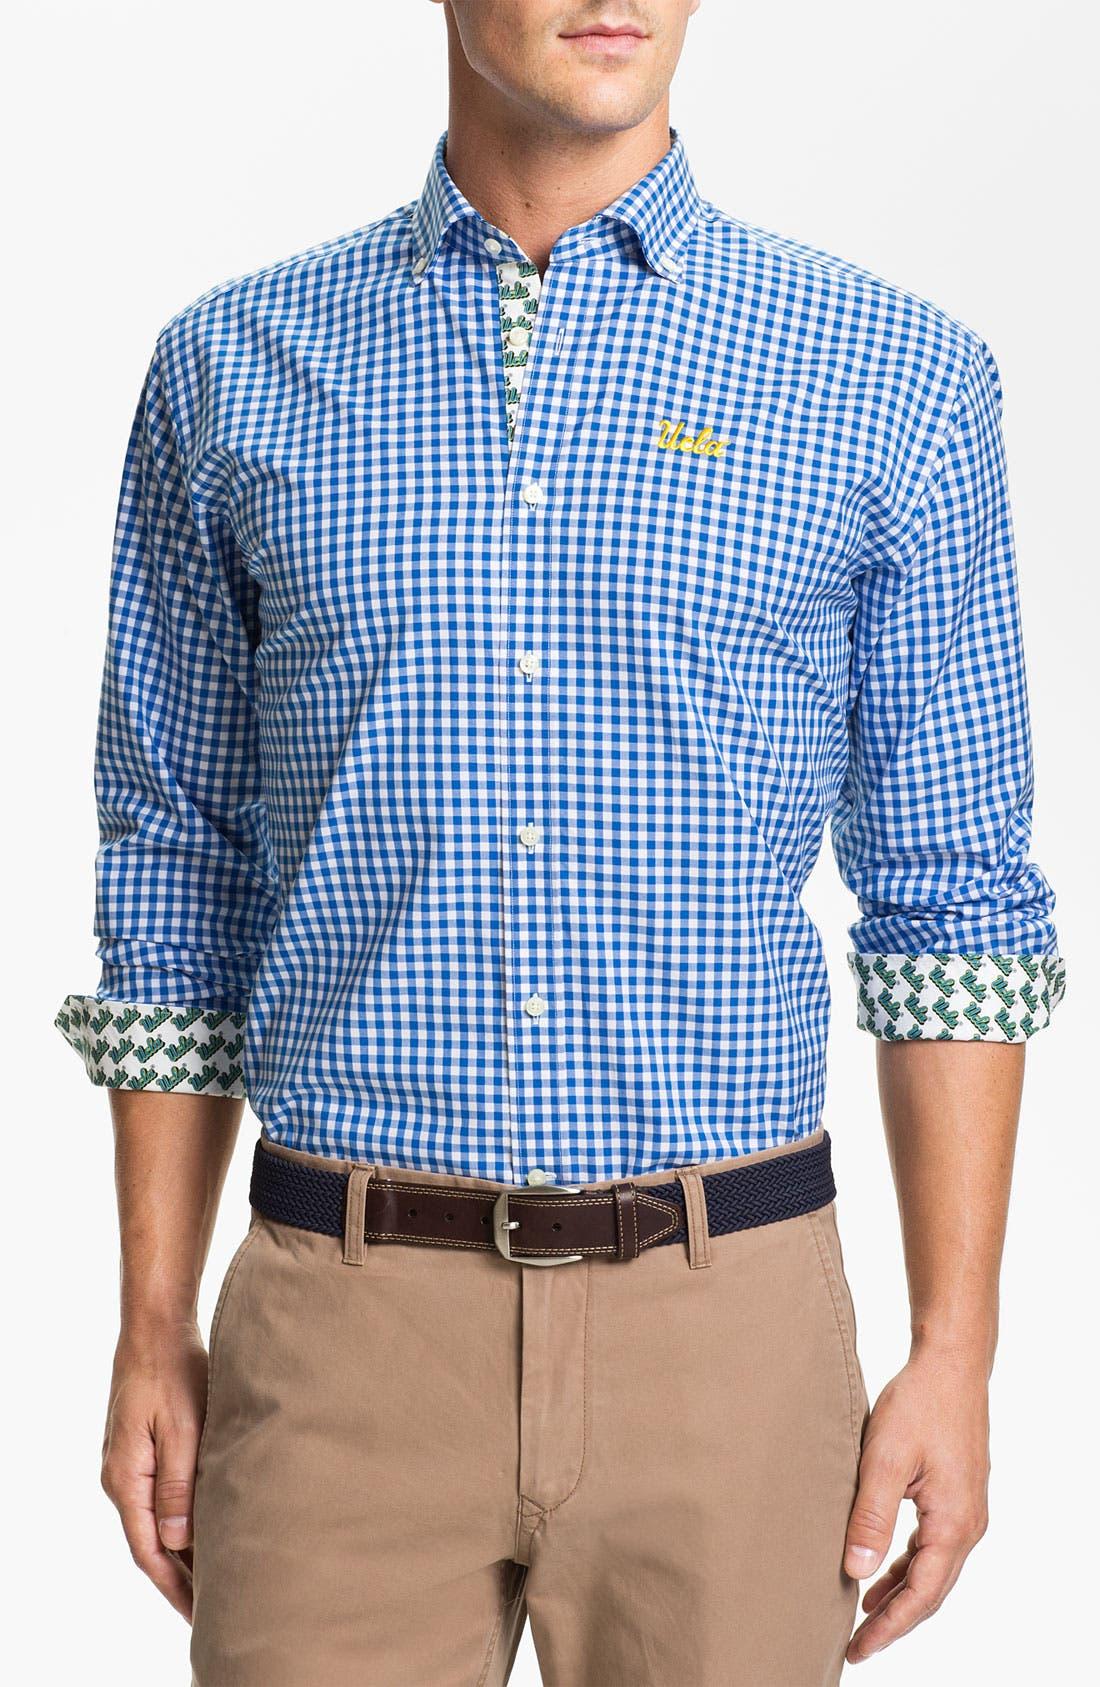 Alternate Image 1 Selected - Thomas Dean 'UCLA' Gingham Sport Shirt